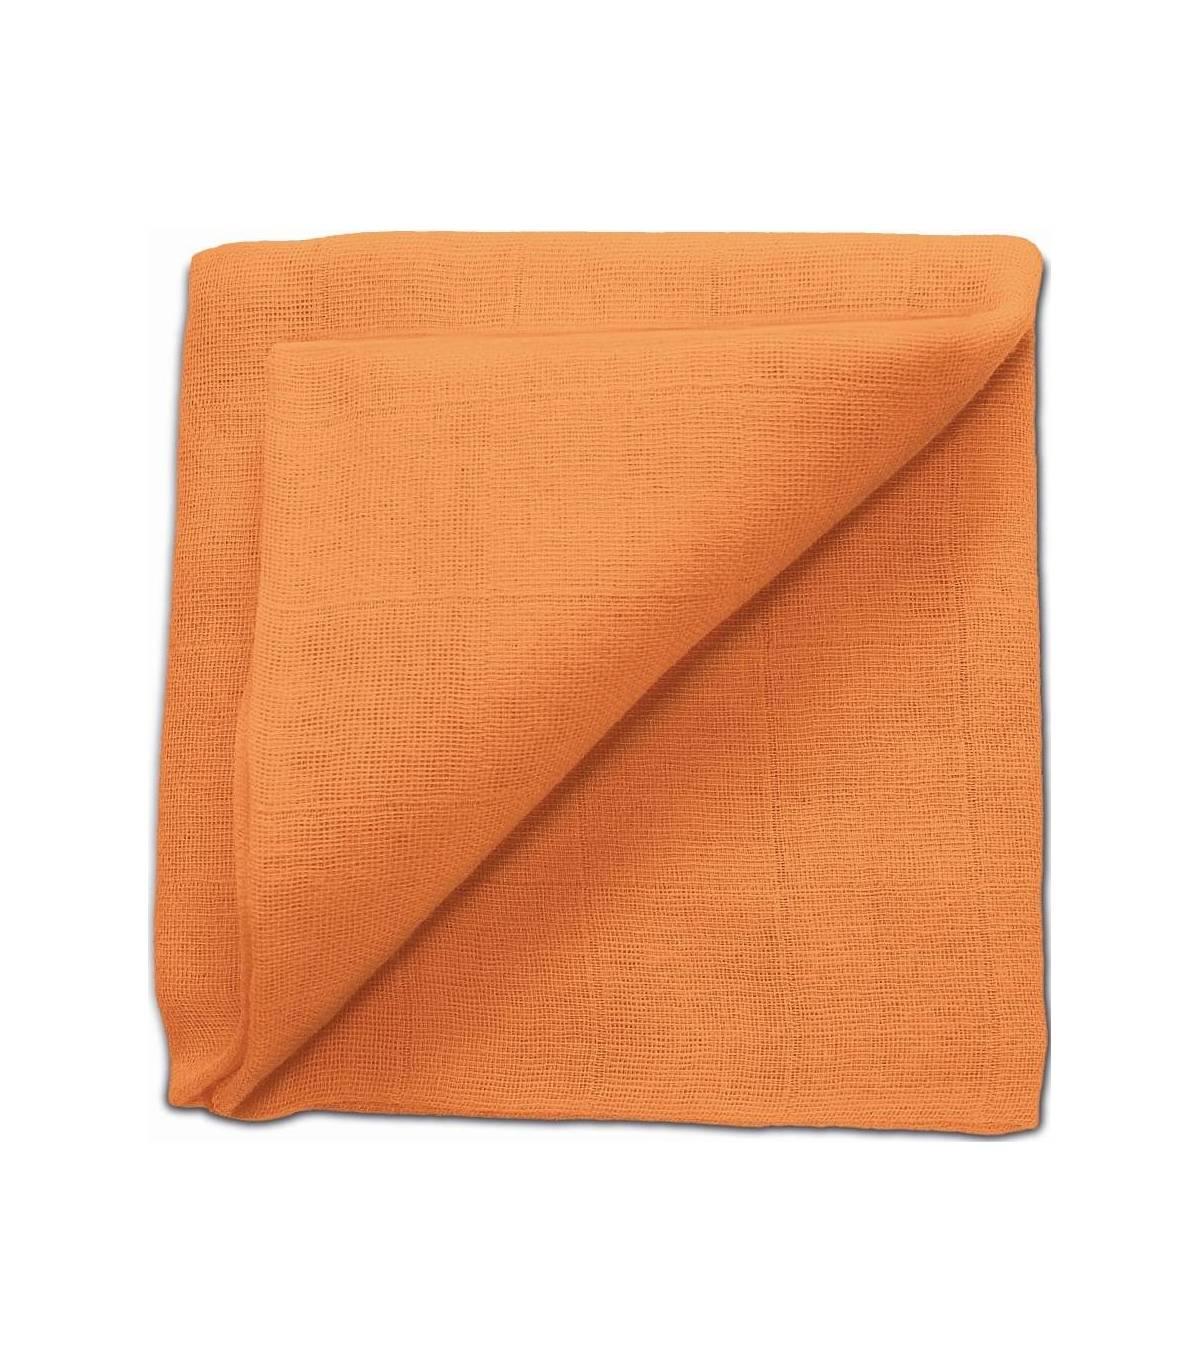 Zewi Bébé-Jou Baby Gaze UNI Bunt 60x60 (Nuscheli) Orange